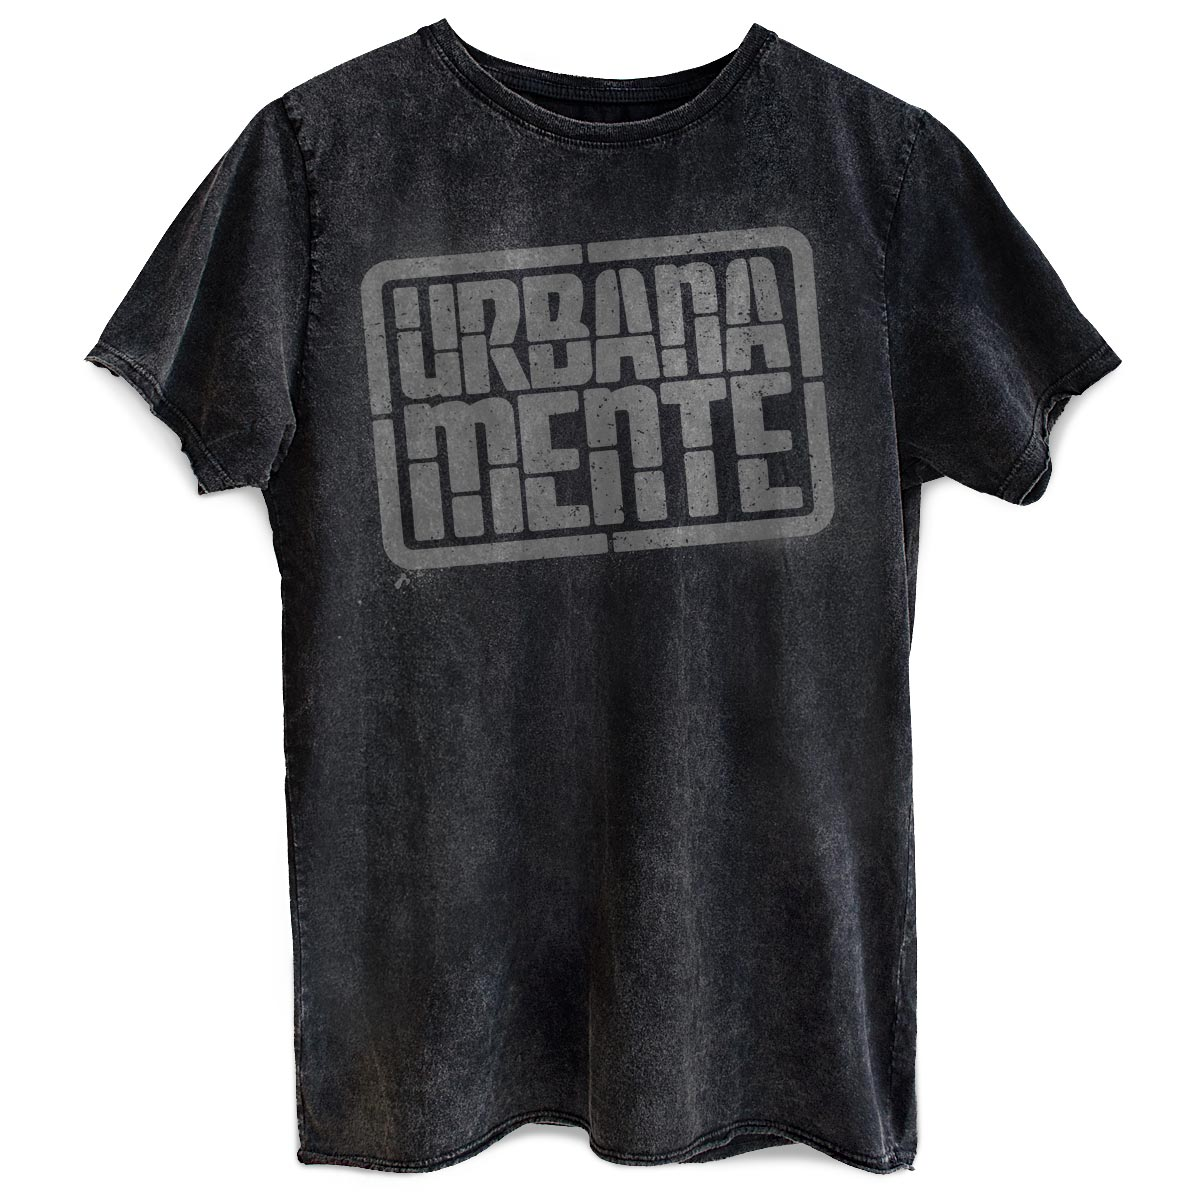 Camiseta Masculina Urbanamente Type